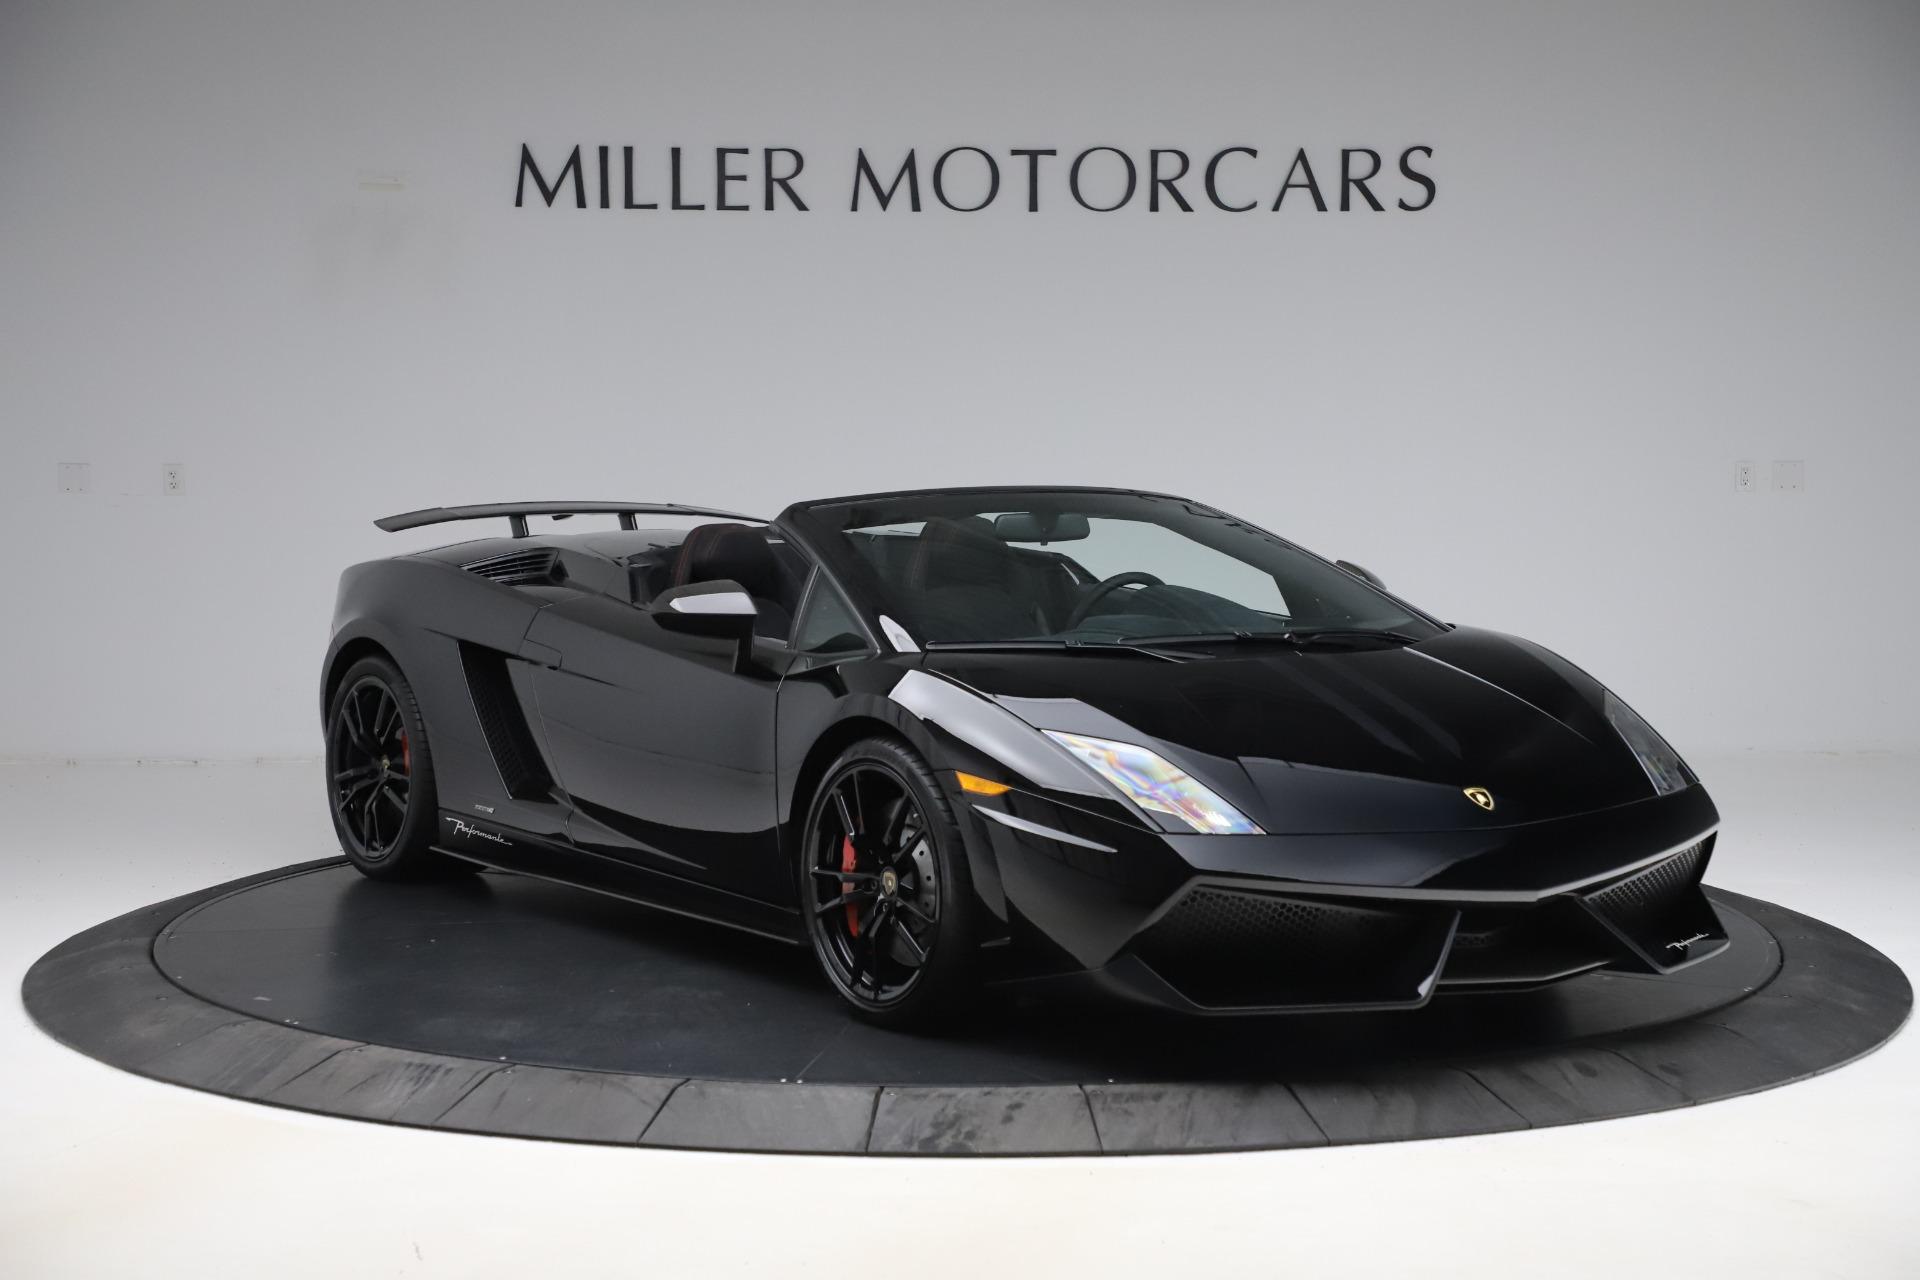 Pre Owned 2013 Lamborghini Gallardo Lp 570 4 Spyder Performante For Sale Miller Motorcars Stock 7760c